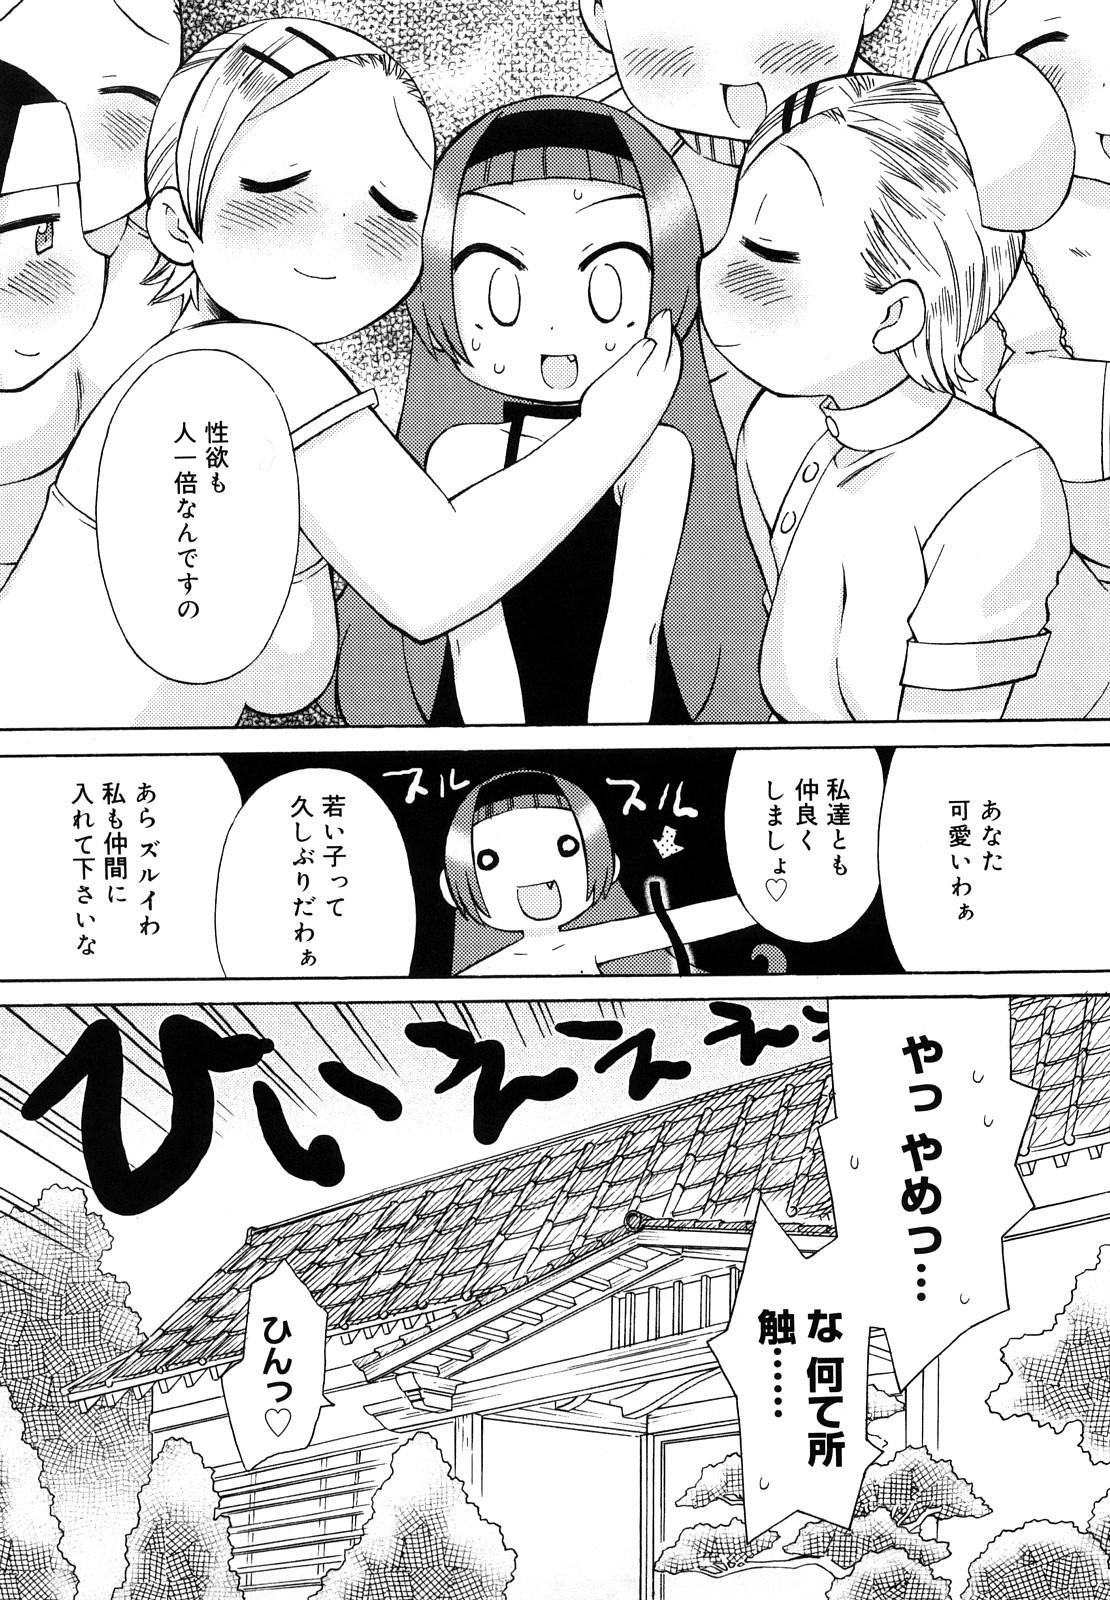 Hatsuden Pandakun! Shinsouban 199